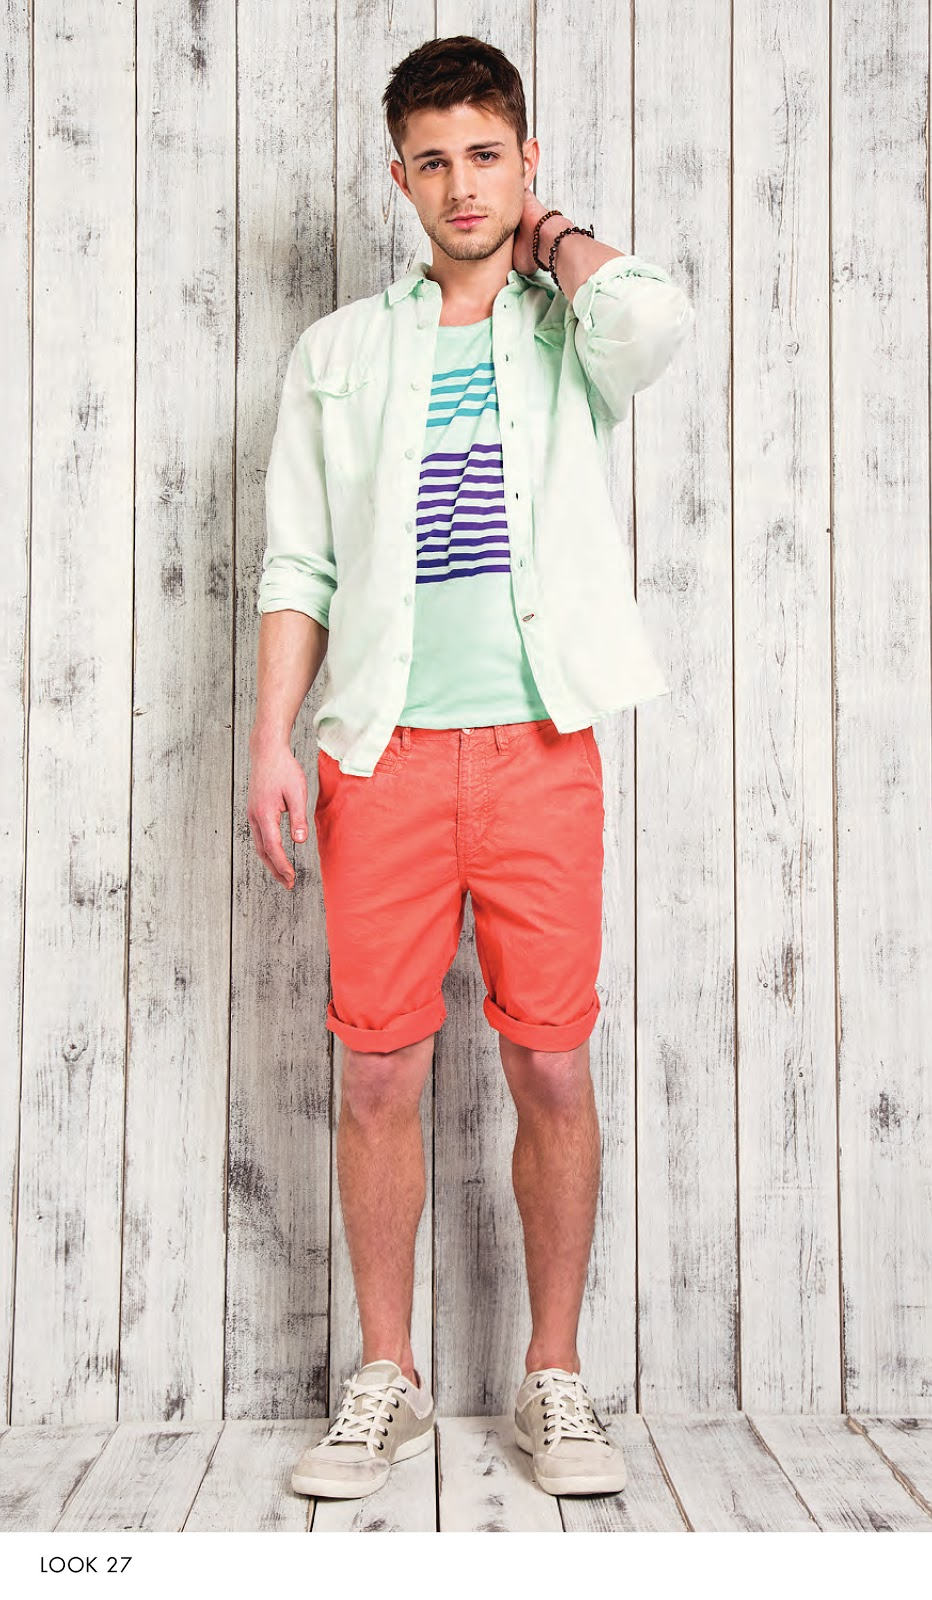 Menswear summercourse